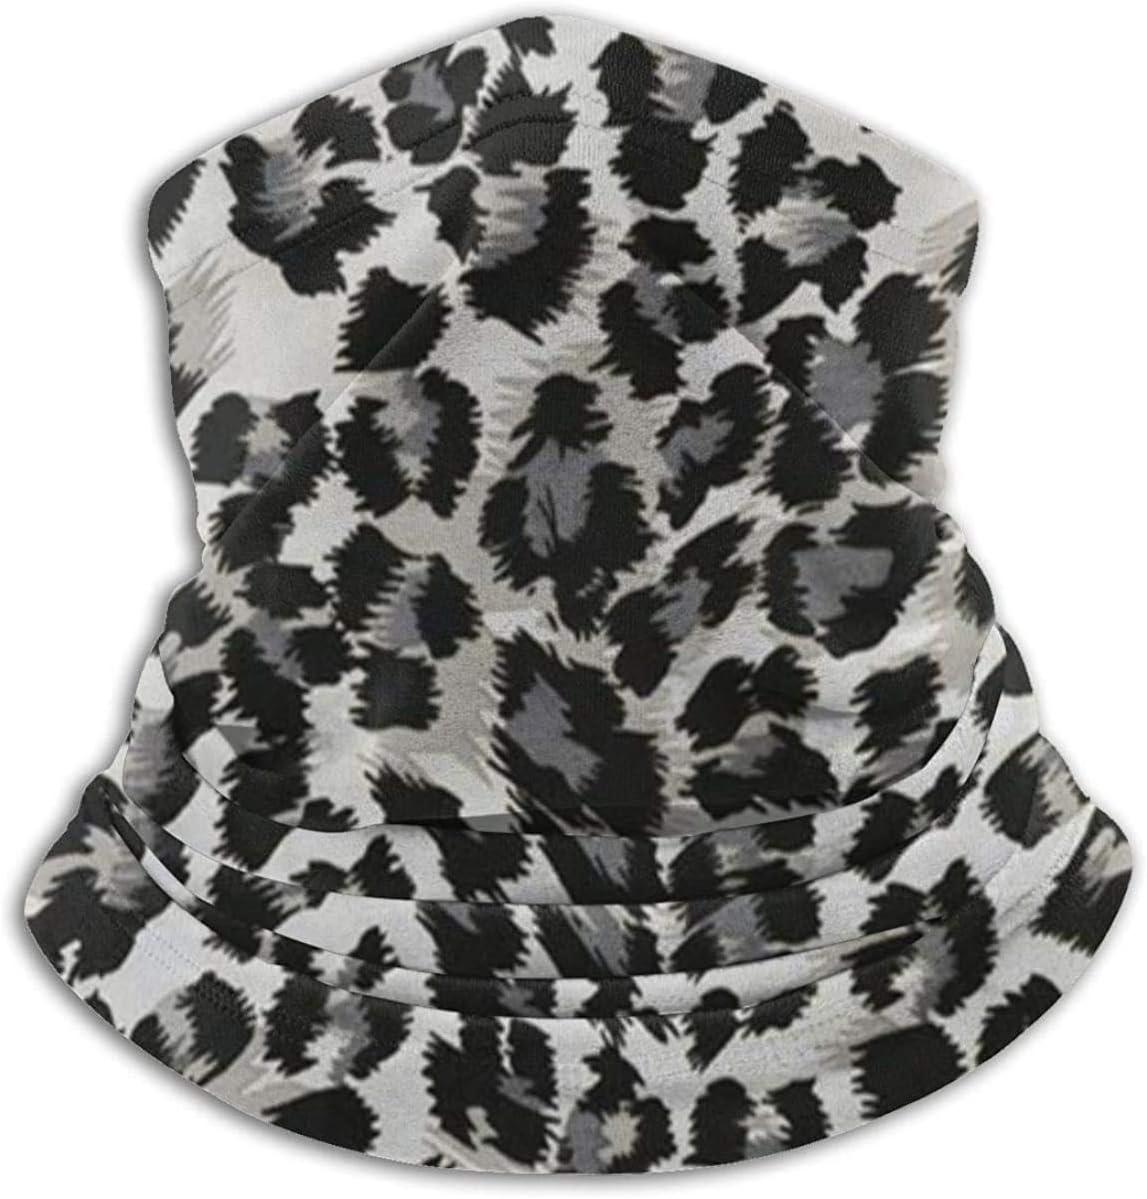 Lastbest Grey Black Leopard Pattern Animal Print Neck Warmer Multifunction Scarf Hat Neck Gaiter Neck Cap Bala Windproof Neck Heating Wrap Outdoor Sports